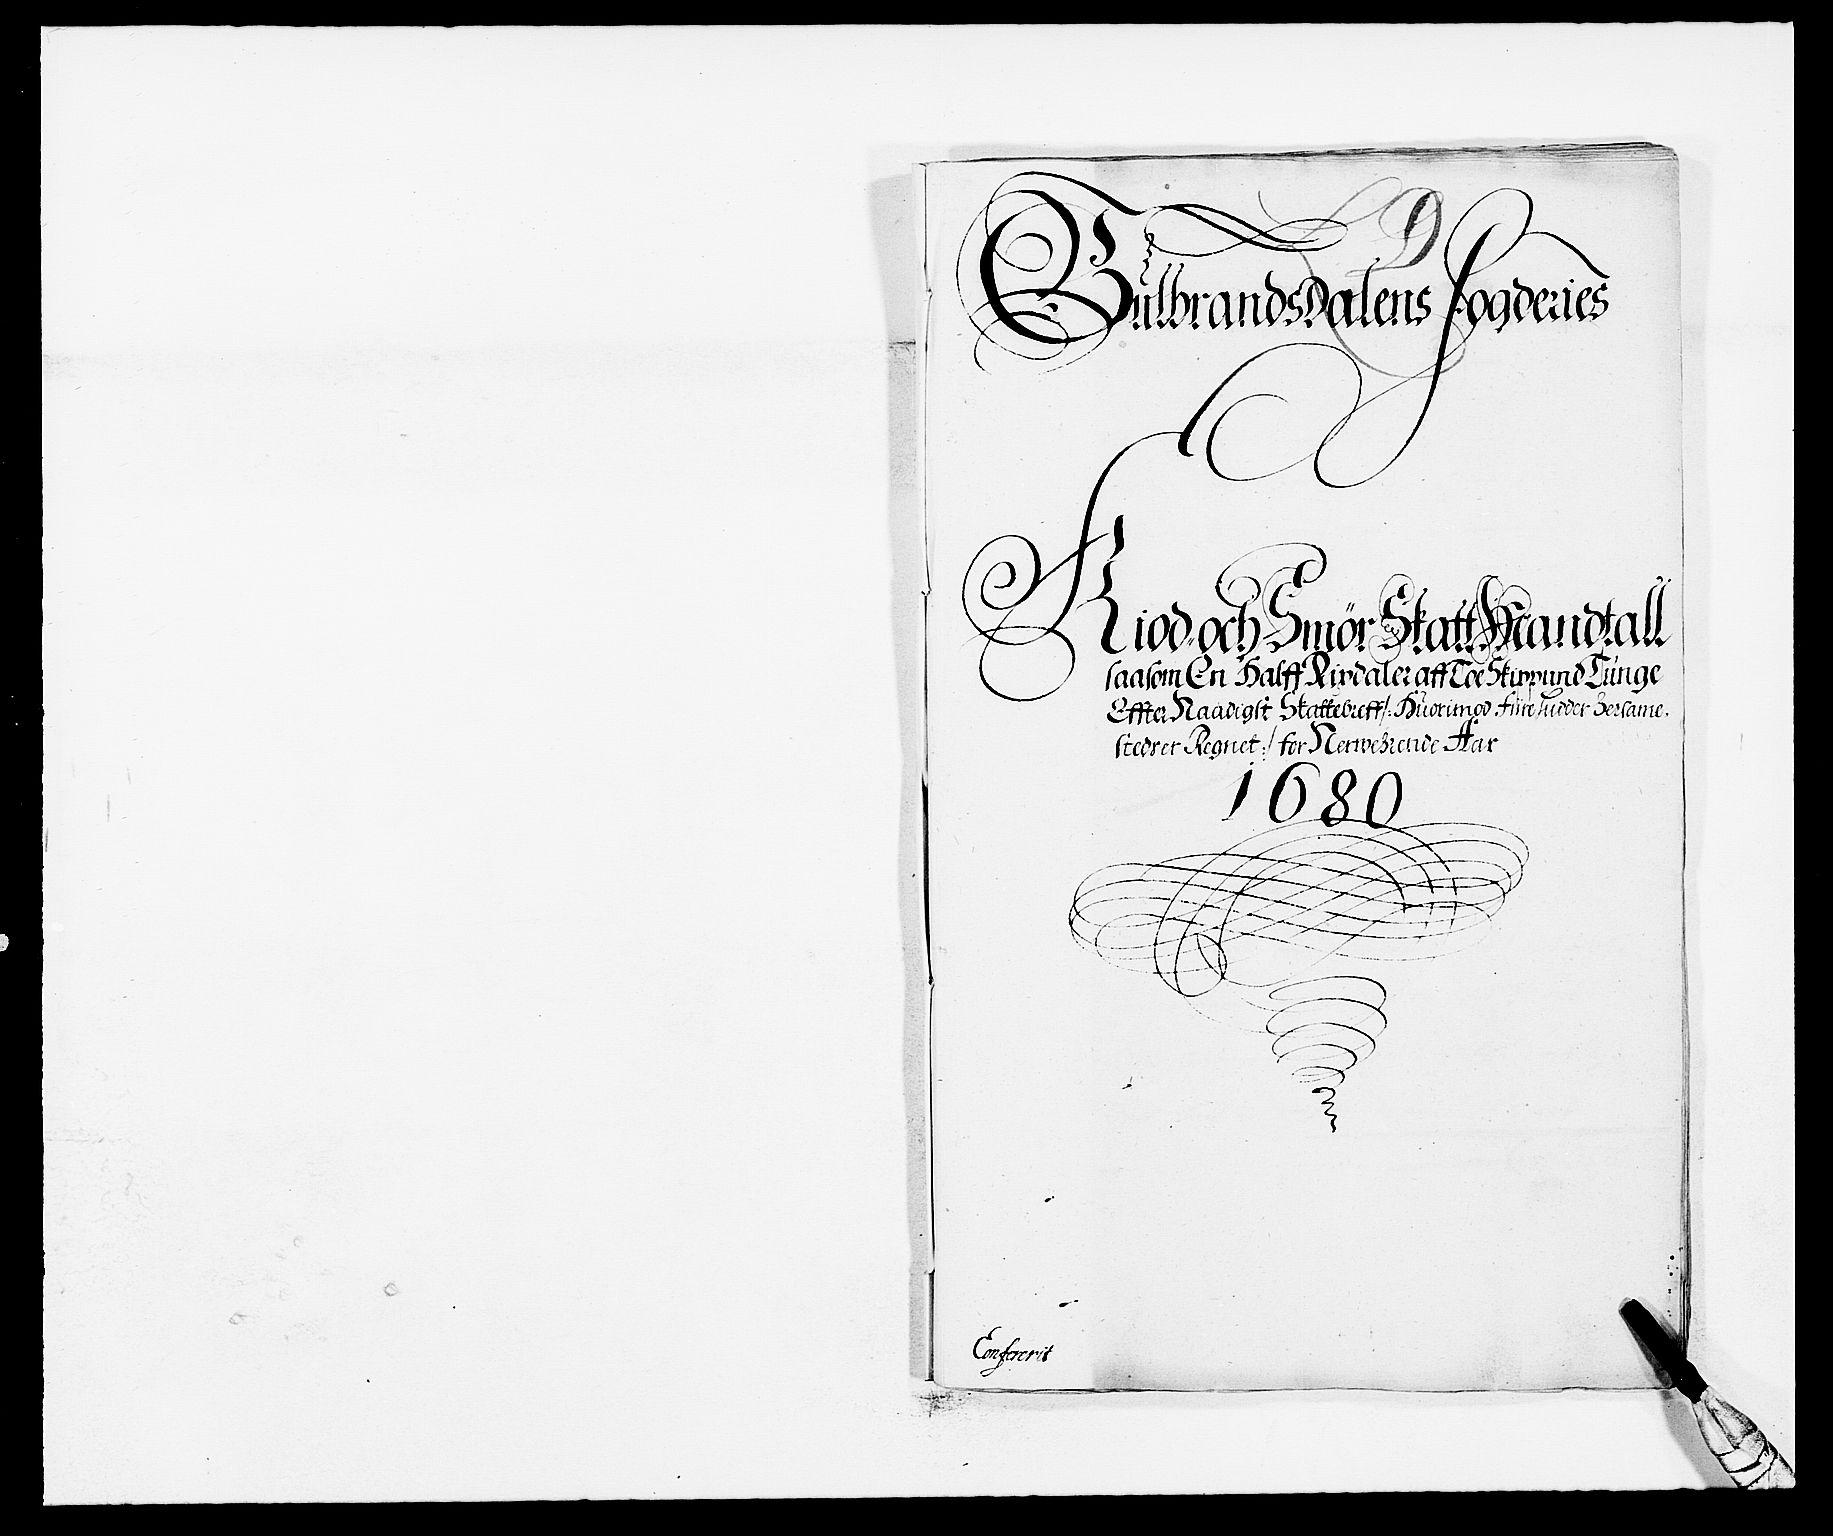 RA, Rentekammeret inntil 1814, Reviderte regnskaper, Fogderegnskap, R17/L1154: Fogderegnskap Gudbrandsdal, 1680, s. 304